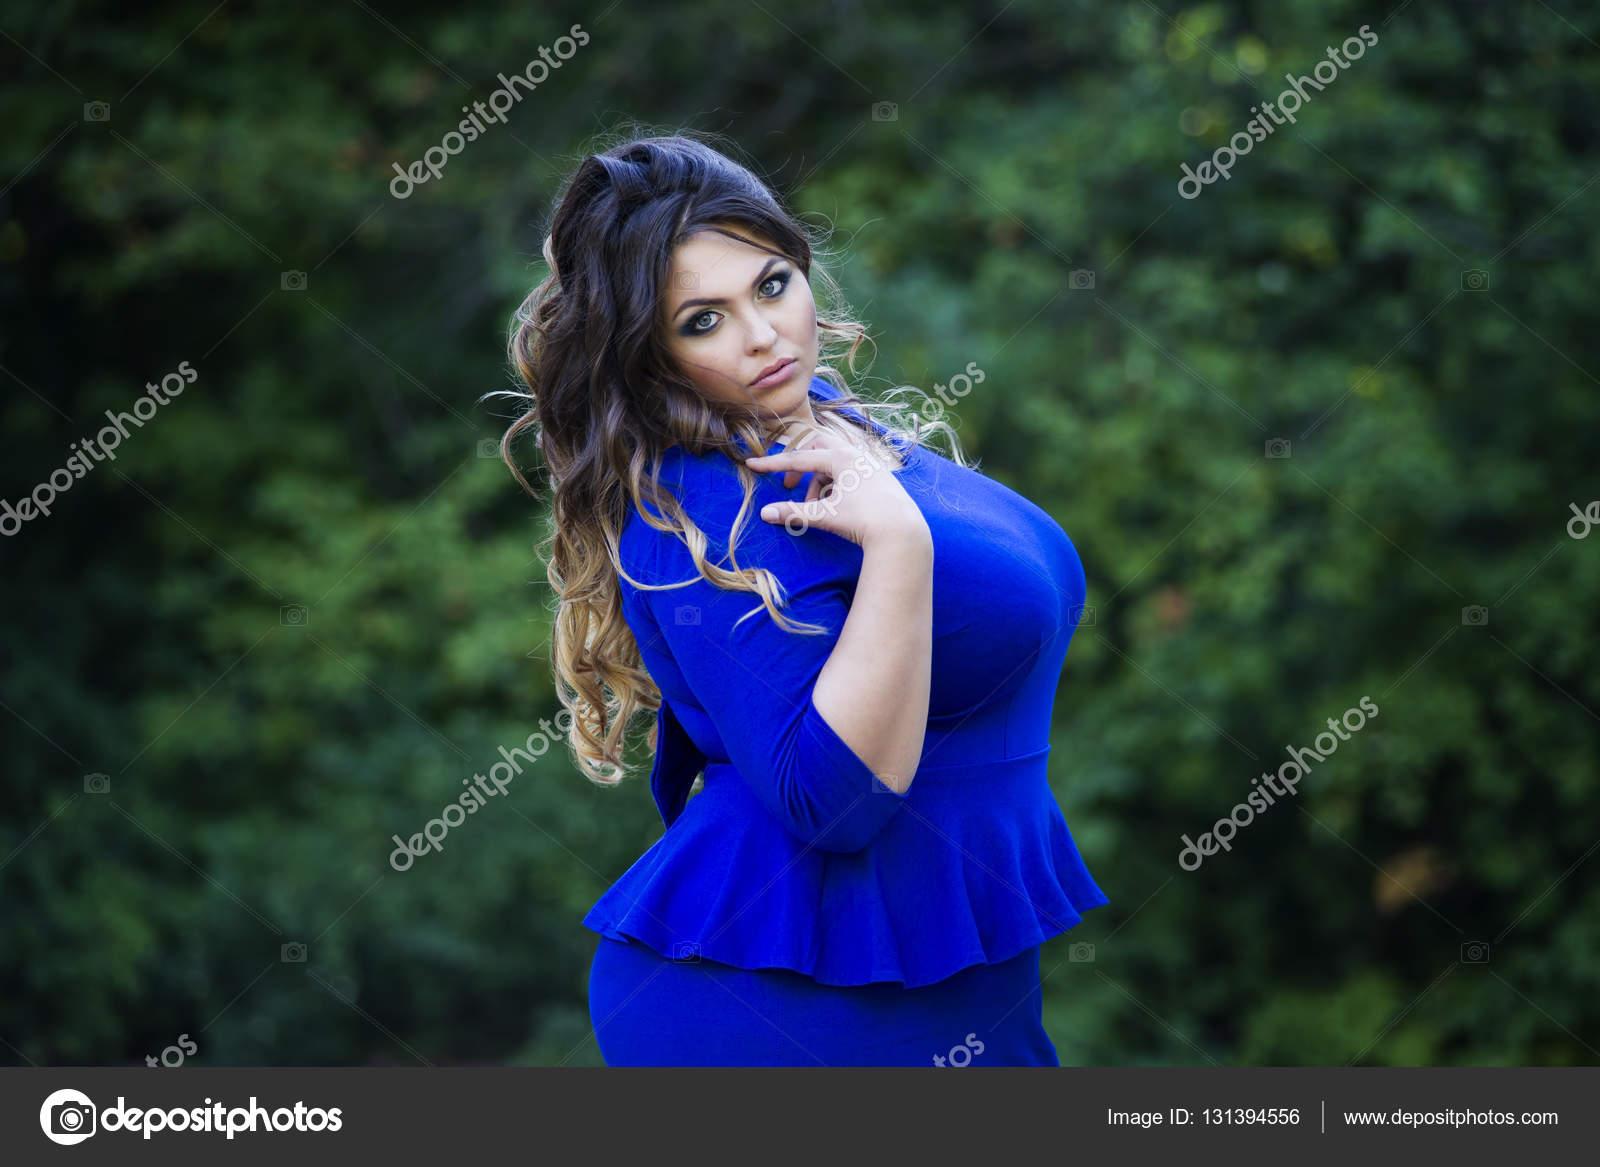 edb49bef2517 Νέοι όμορφη συν μεγέθους μοντέλο σε μπλε φόρεμα σε εξωτερικούς χώρους